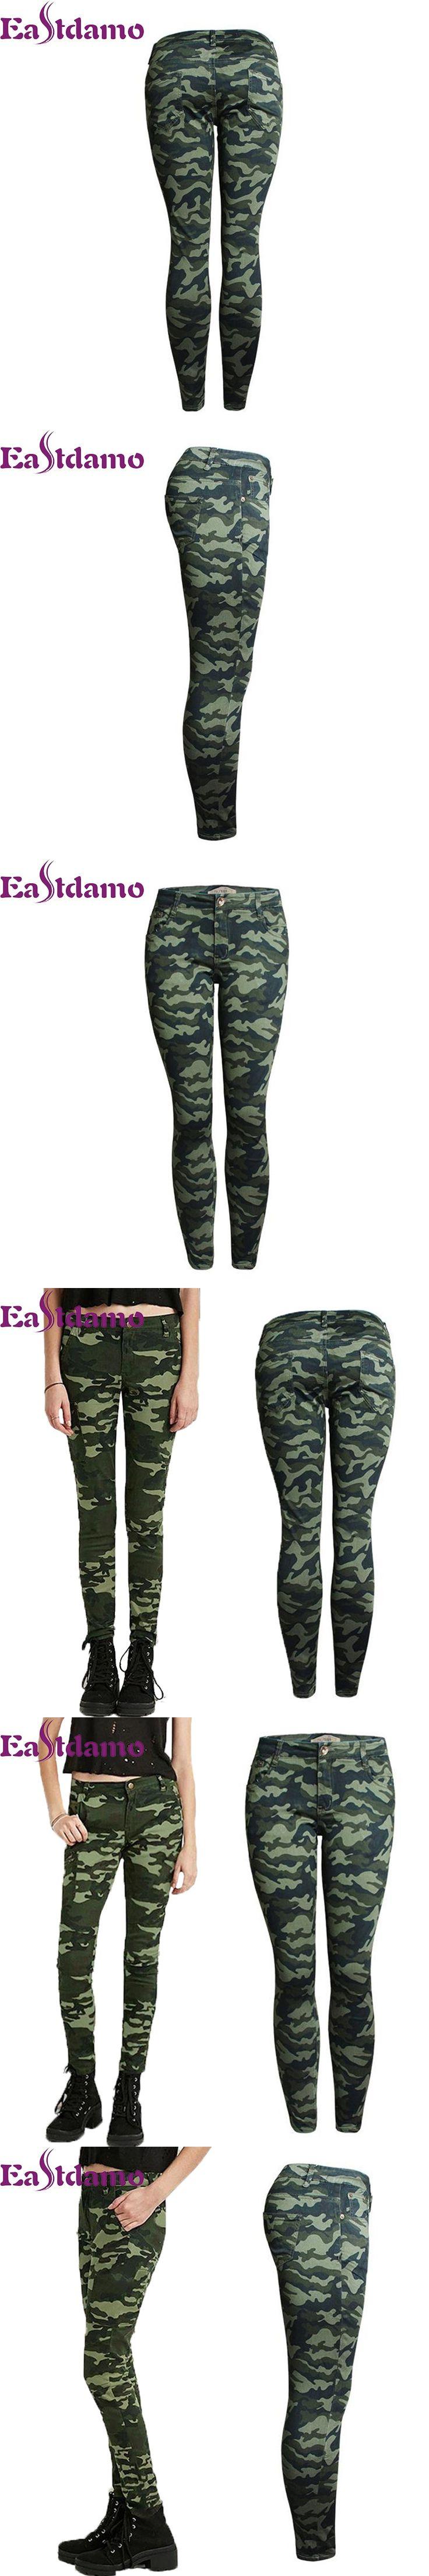 Eastdamo Plus Size S-XXXXXL Women's Camouflage Jeans Army Green Skinny Trousers Slim Fit Pencil Denim Pants High Waist Jeans